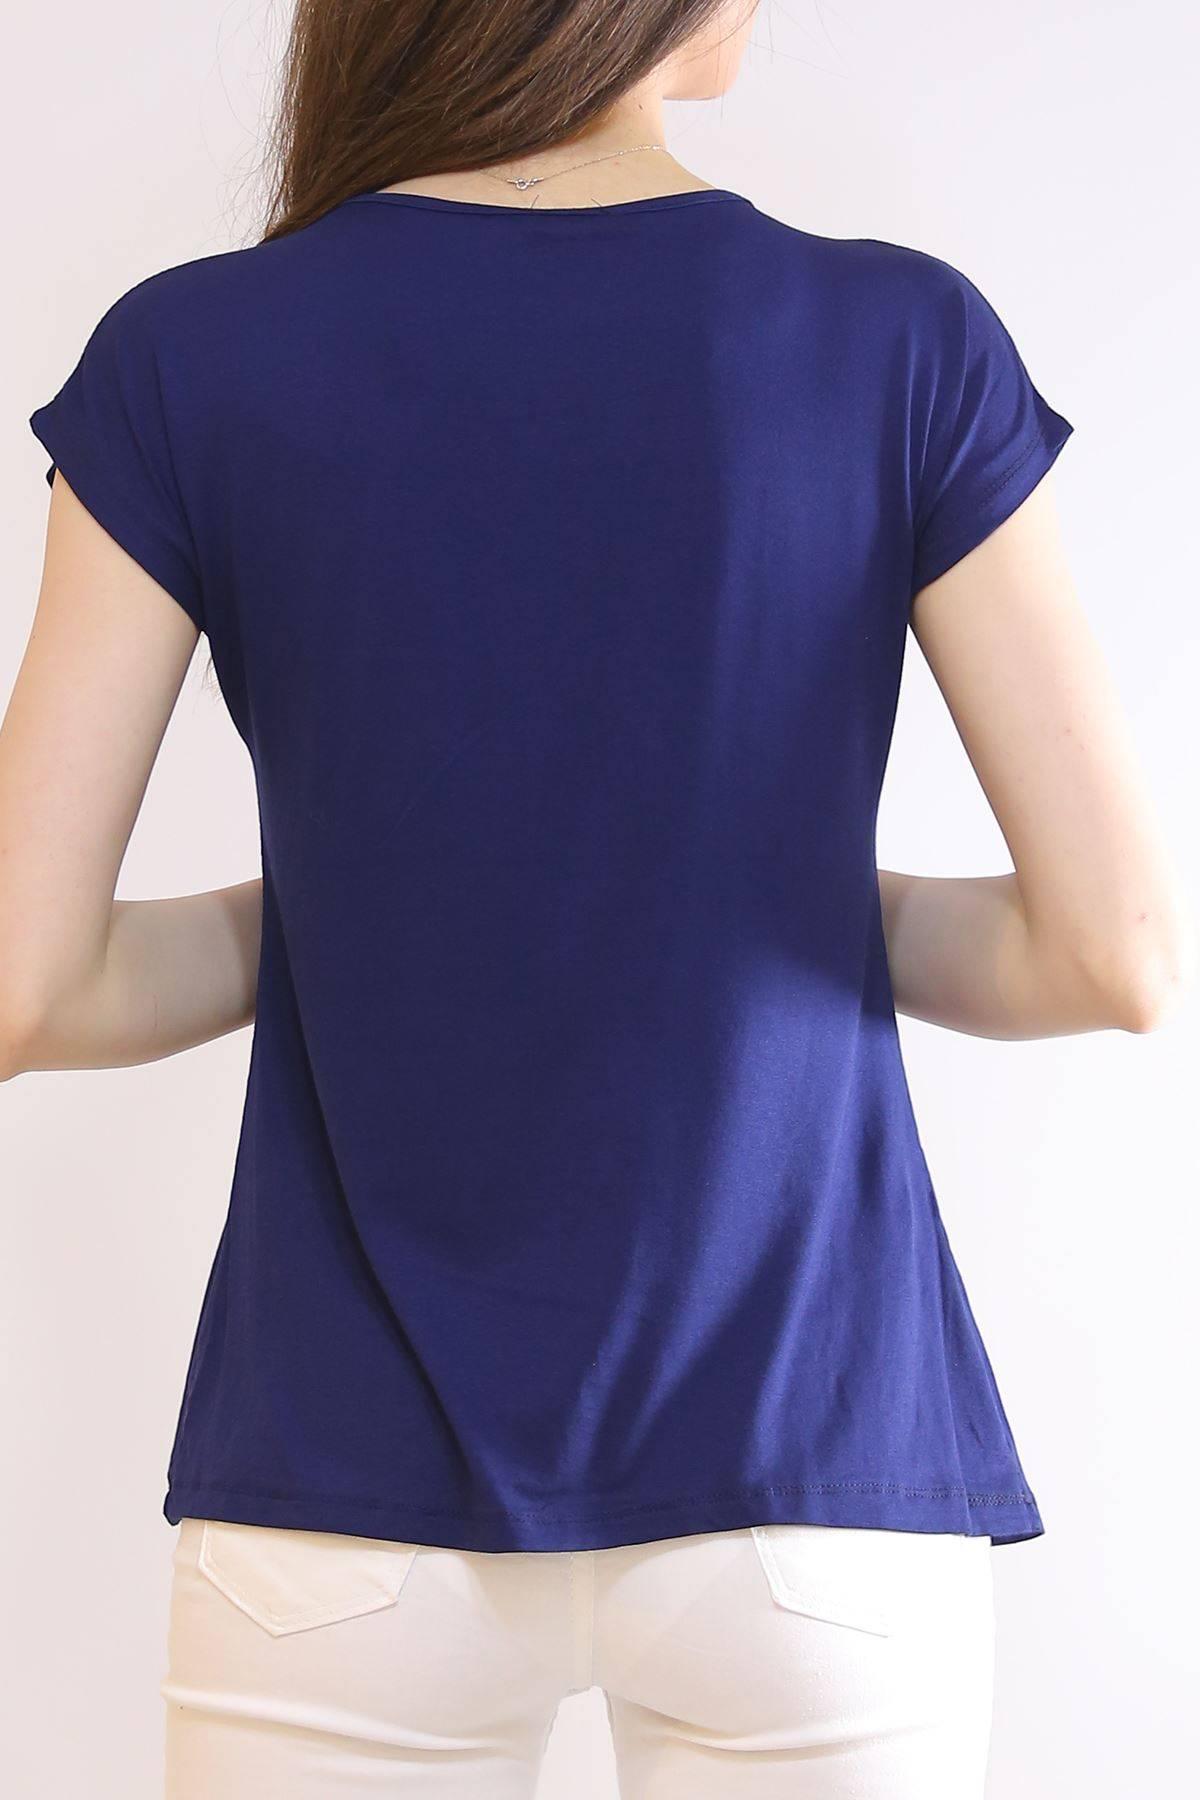 Yarasa Kol Pullu Tişört Lacivert - 5955.599.